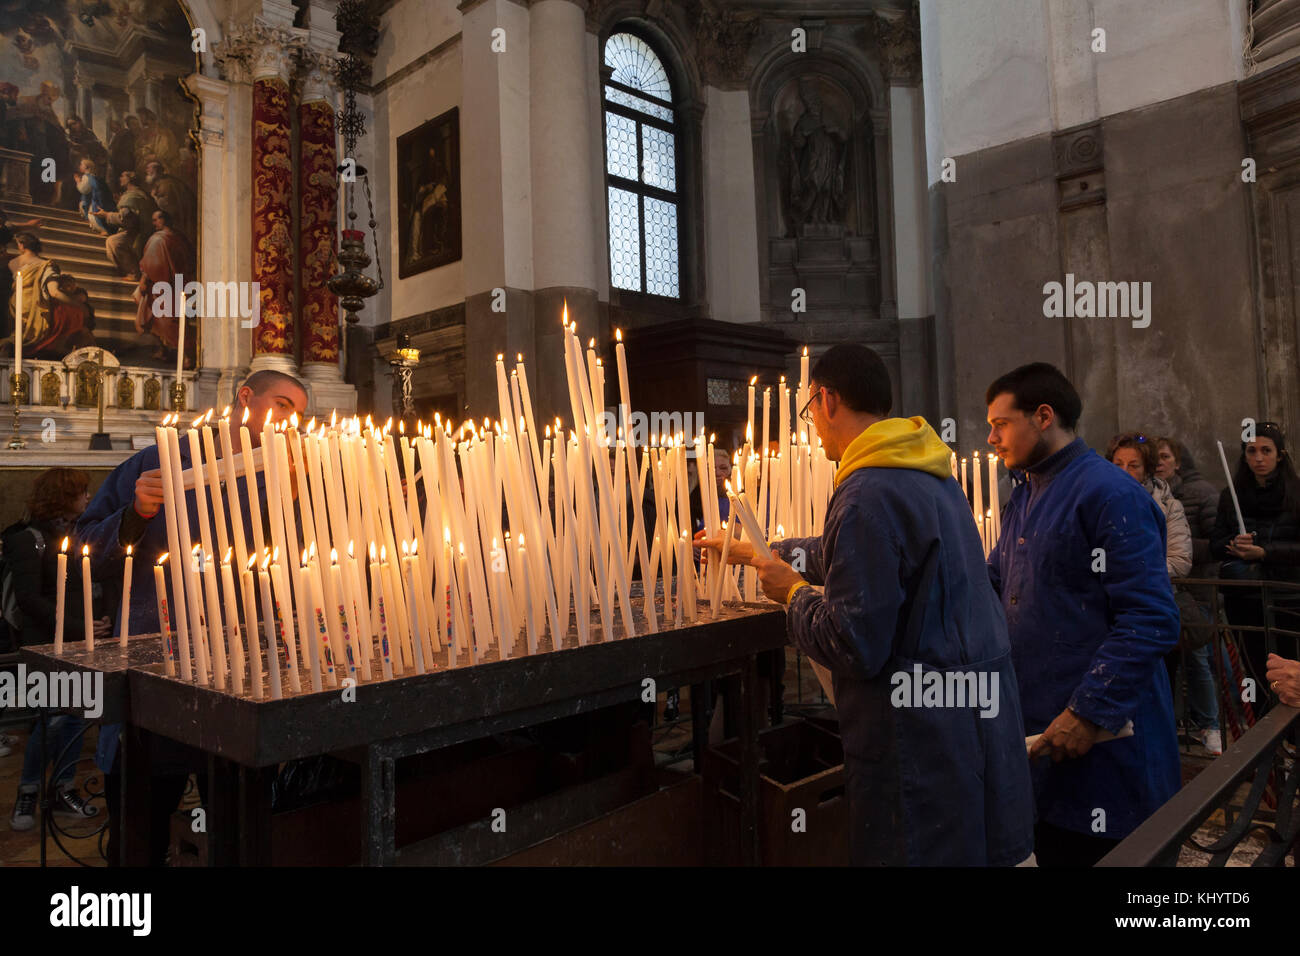 Venice, Italy, 21st November 2017. Festa della Madonna della Salute. The Church of Madonna della Salute was built - Stock Image